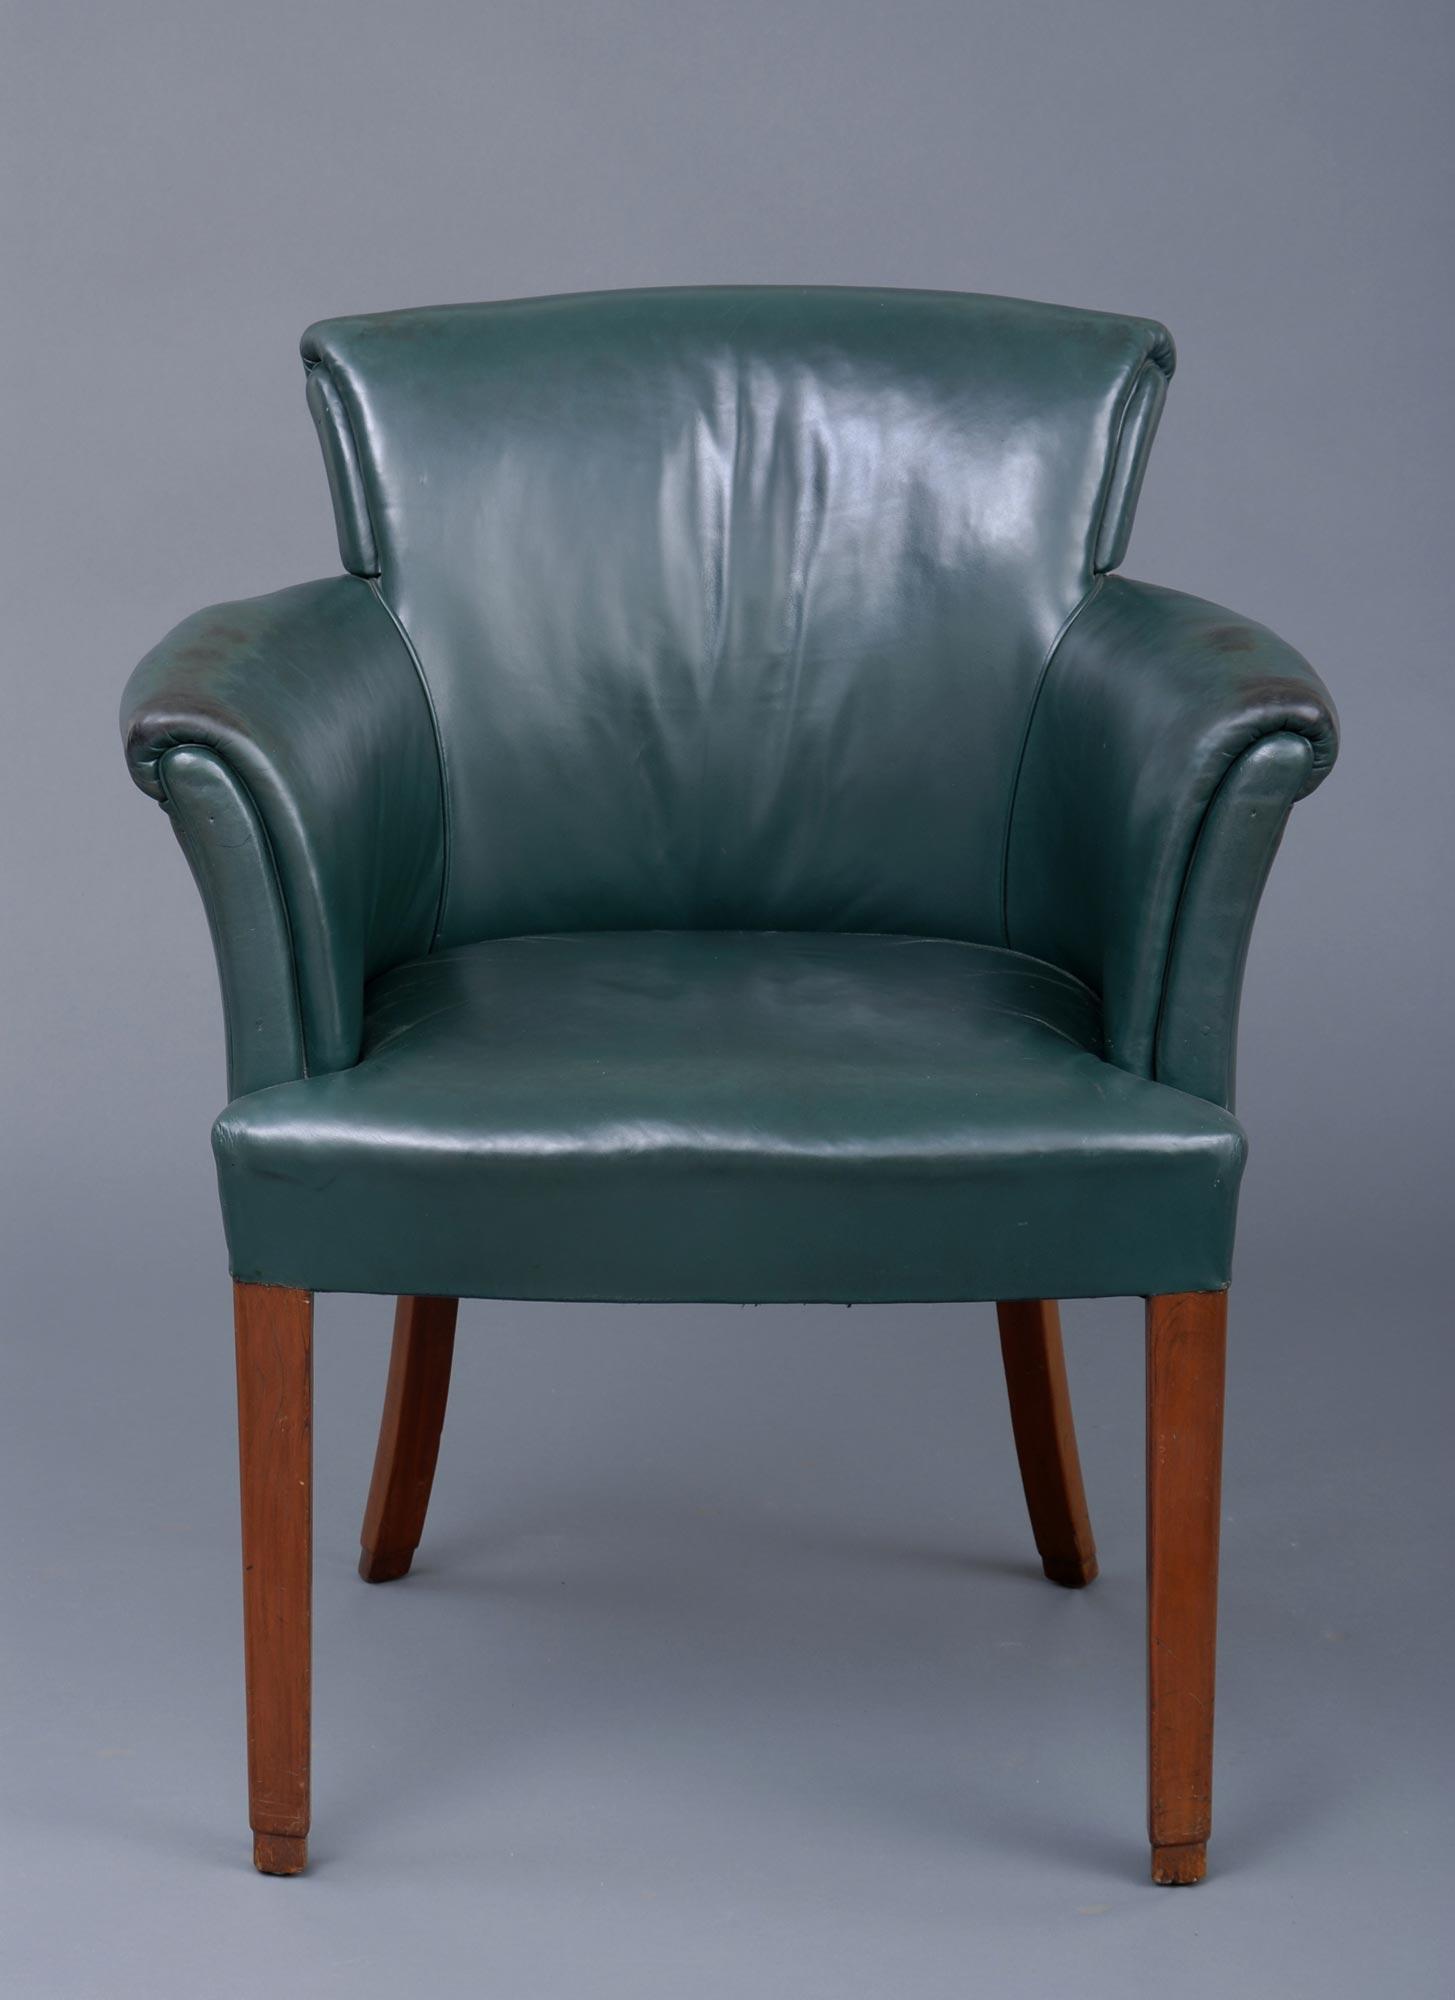 Antique Desk Chair English Art Deco Mahogany Amp Leather